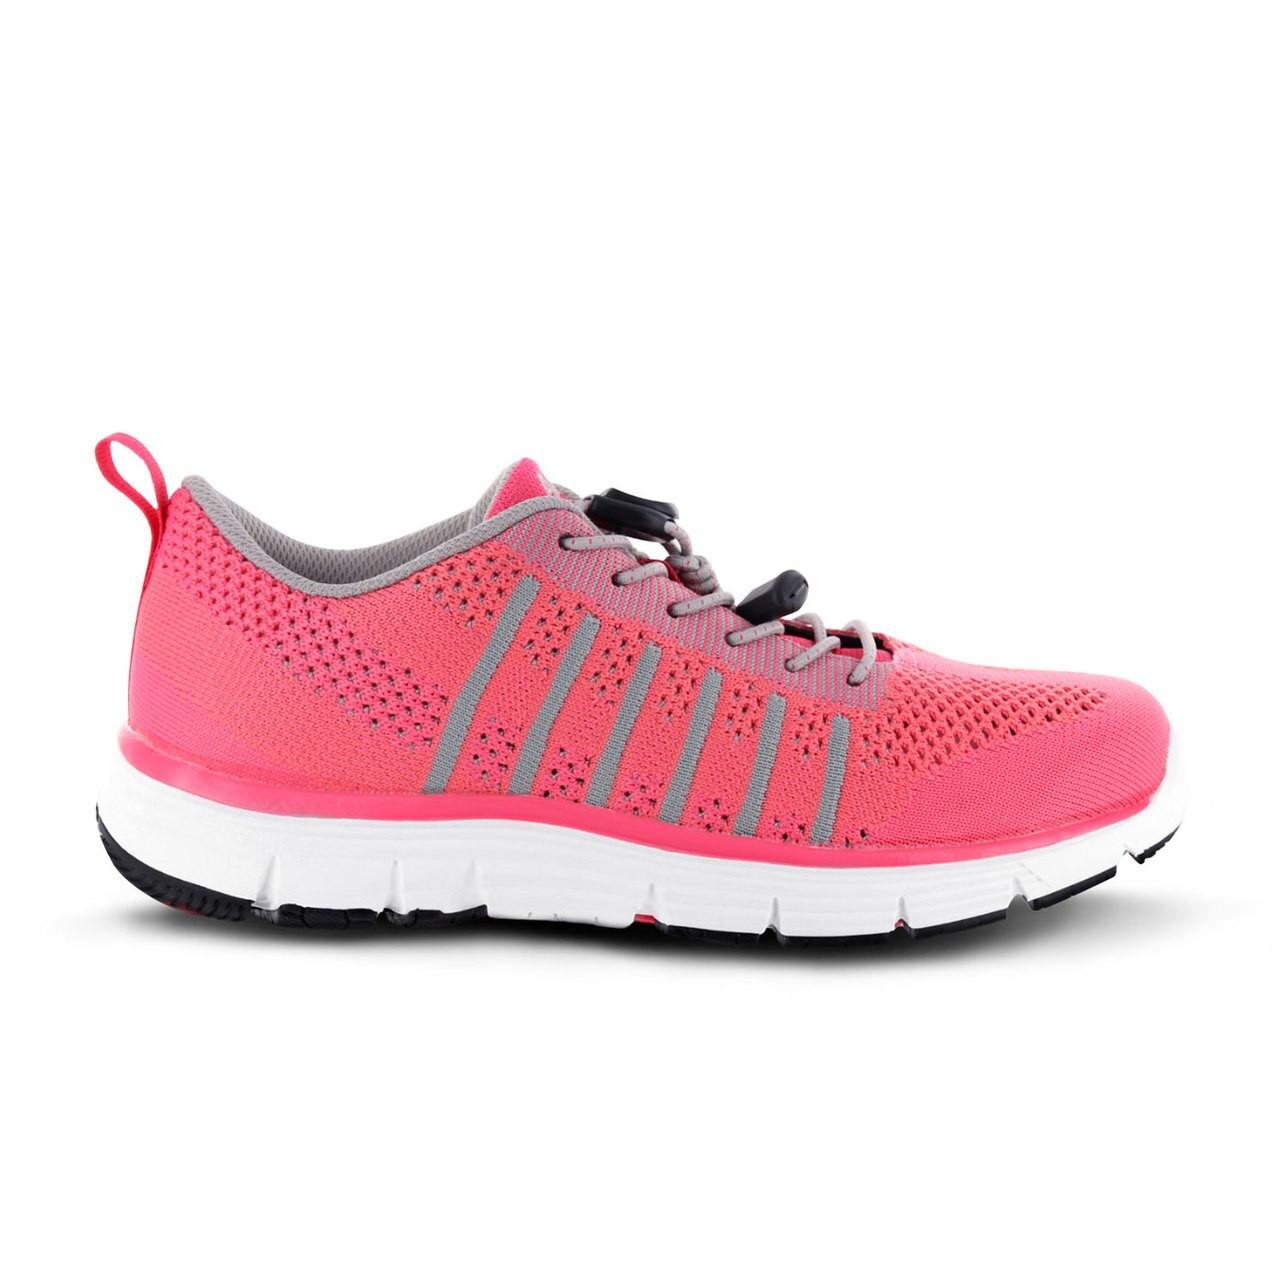 Apex Womens A7100w Breeze Athletic Knit Sneaker Running Shoe